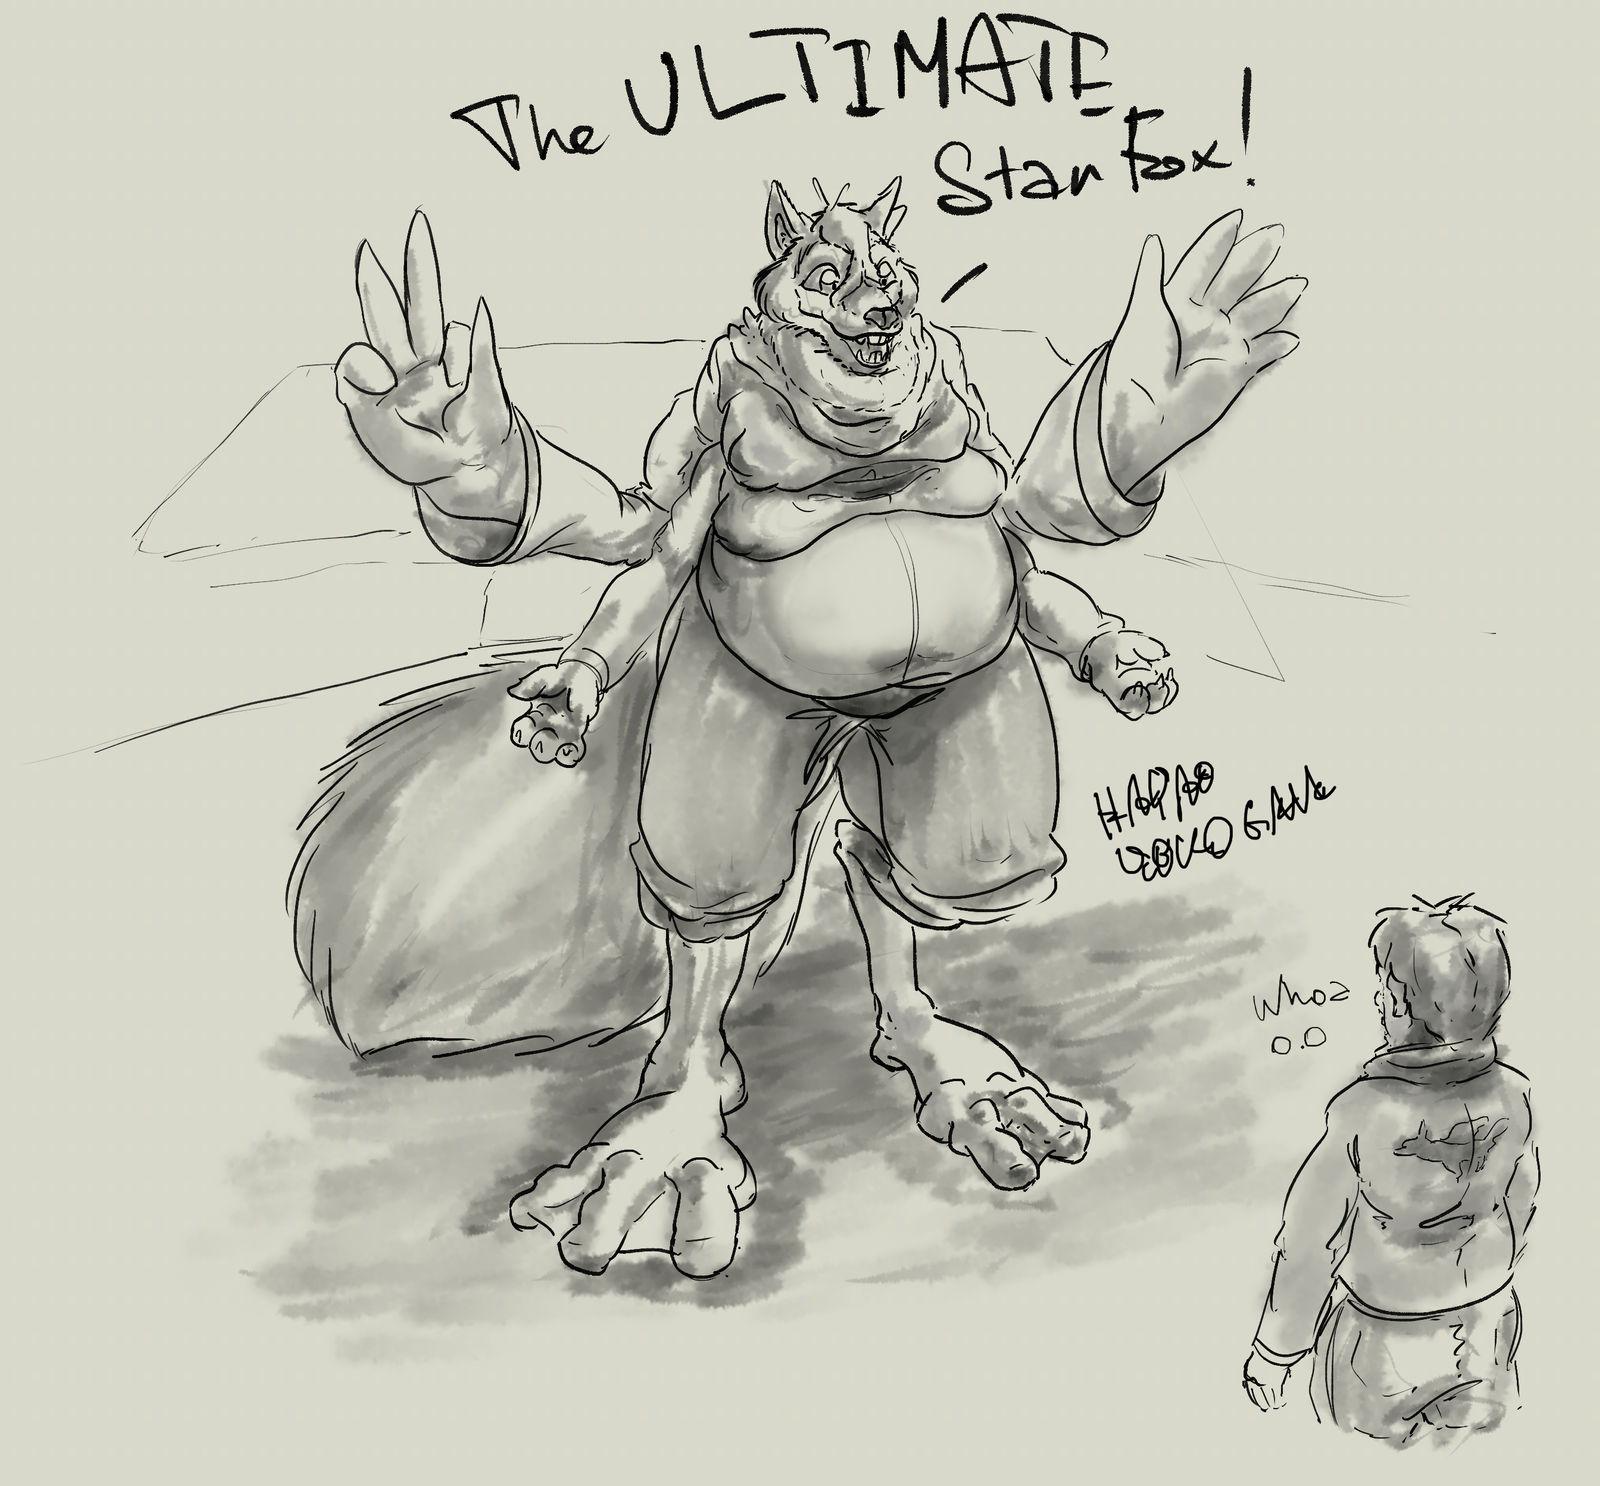 Ultimate Star Fox!